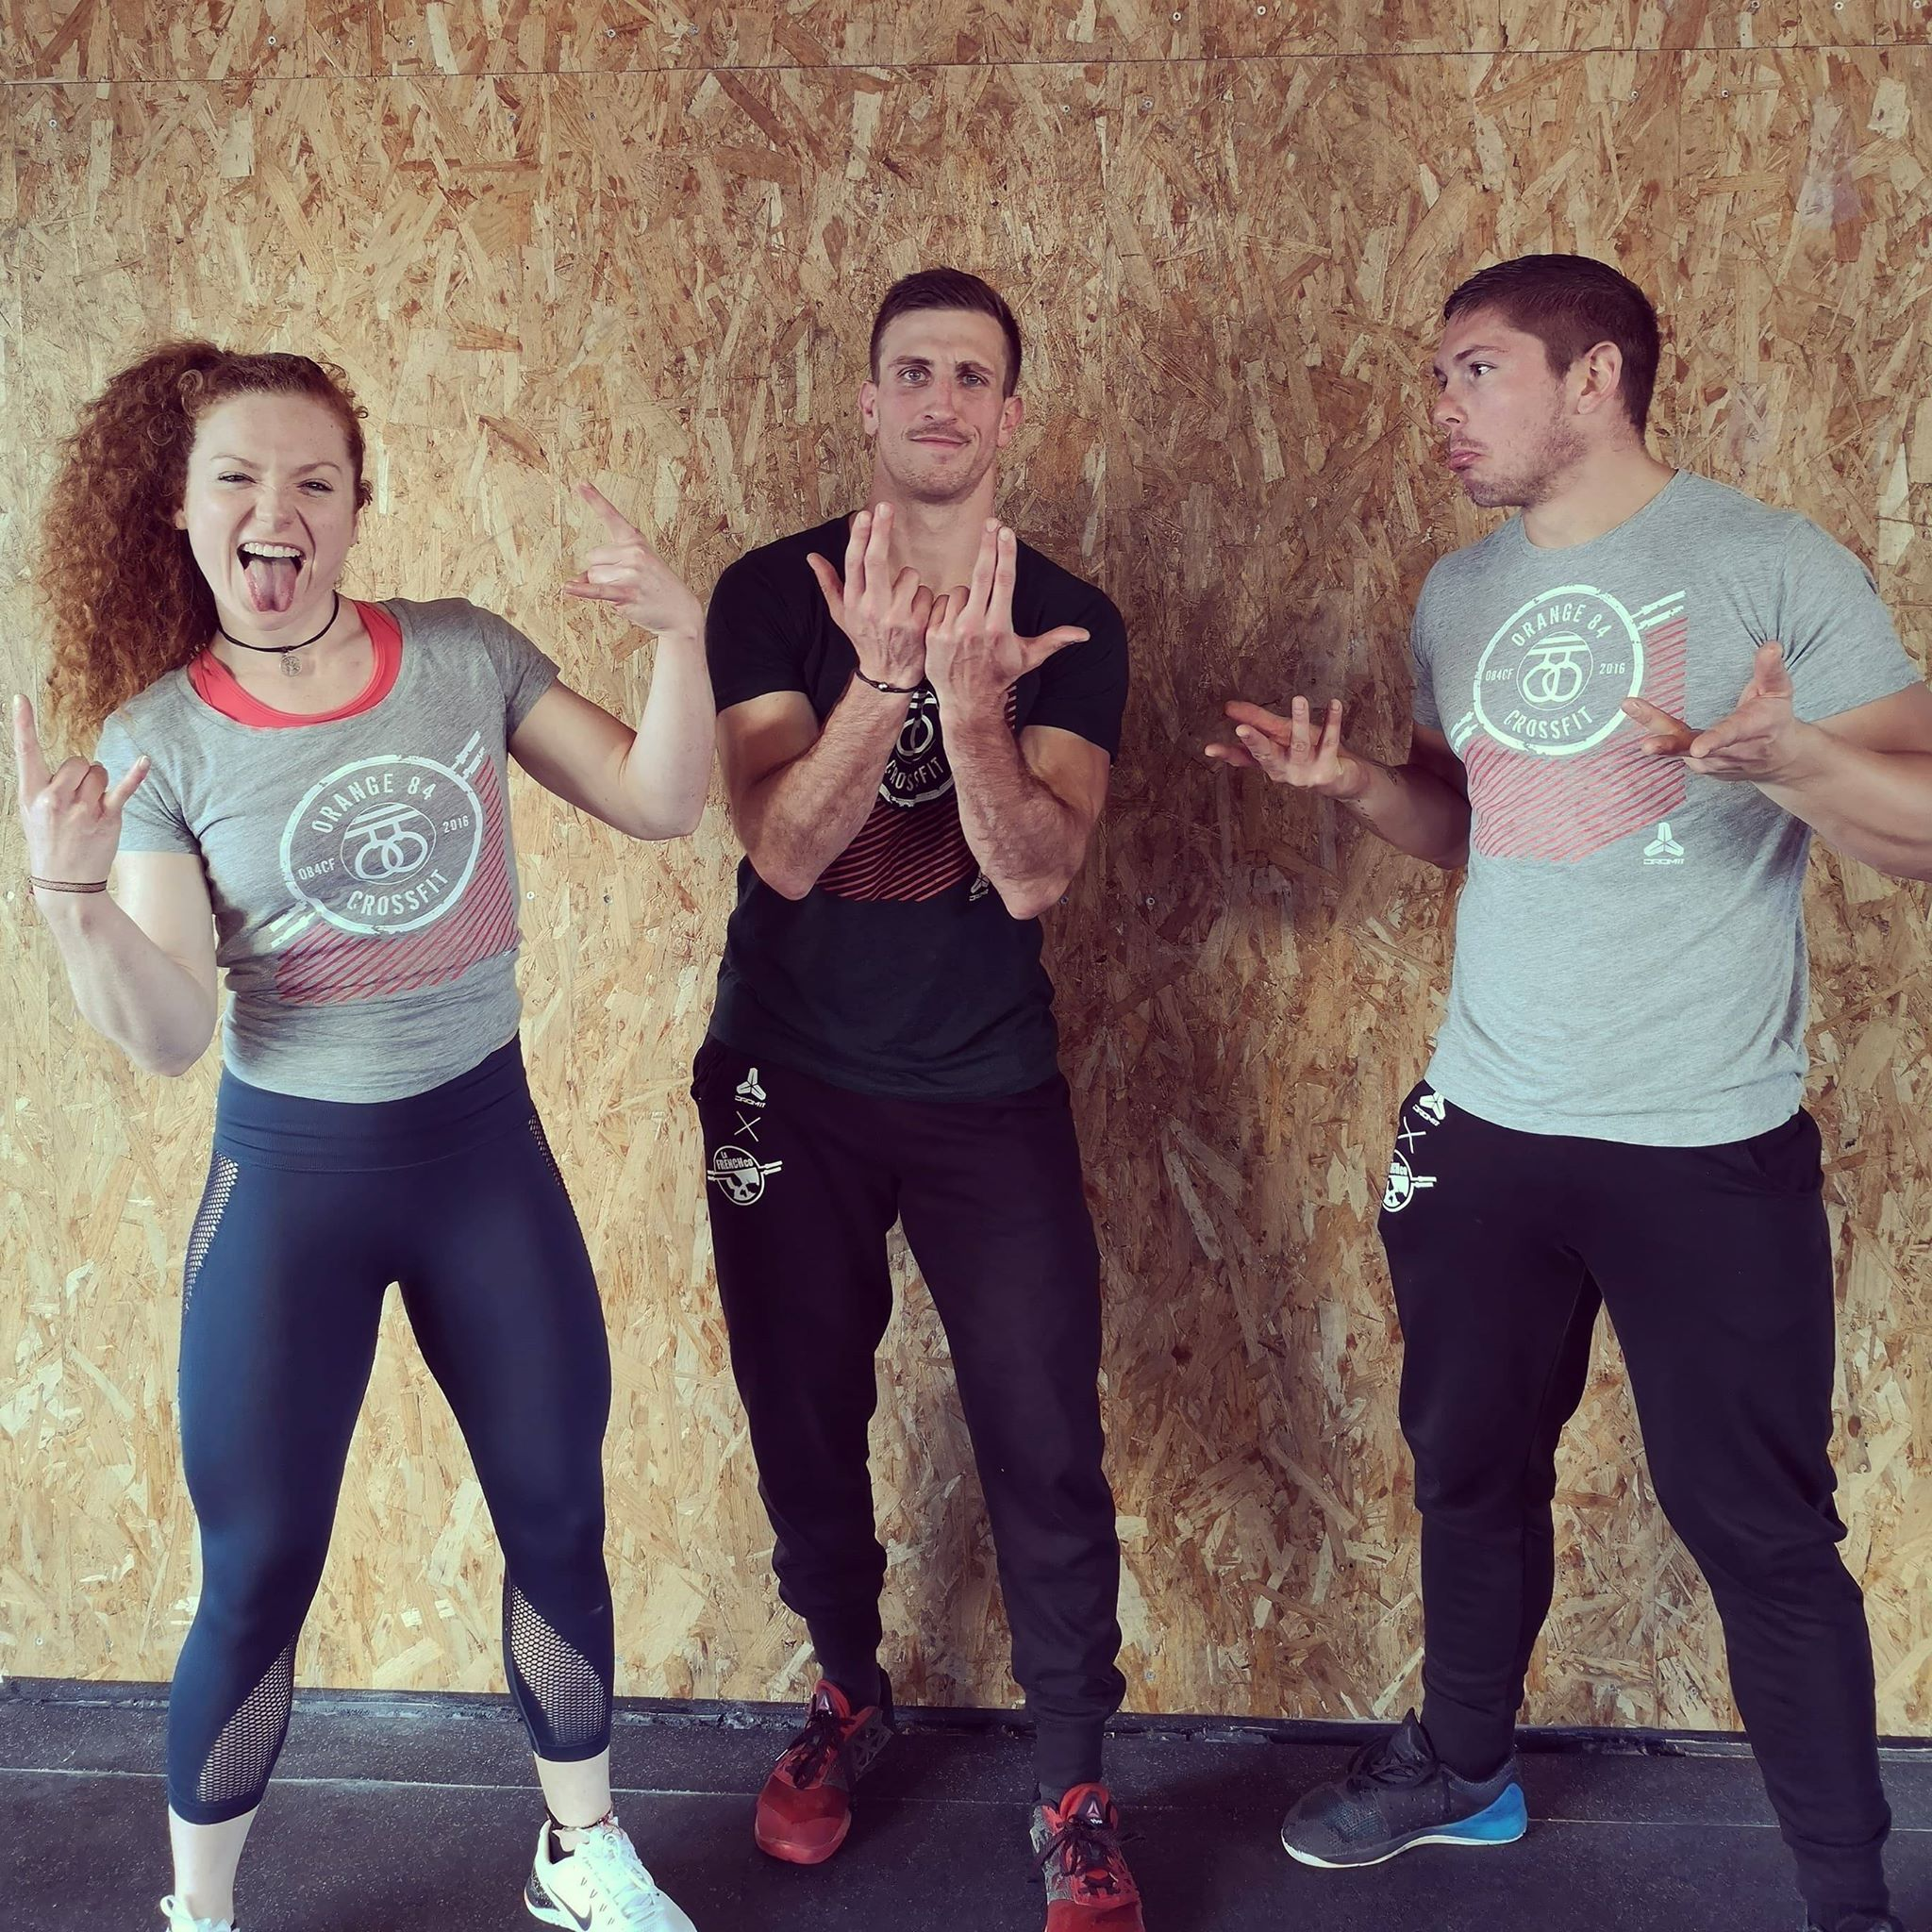 Fin des CrossFit Opens 2019 @ Orange 84 CrossFit #LaProvence